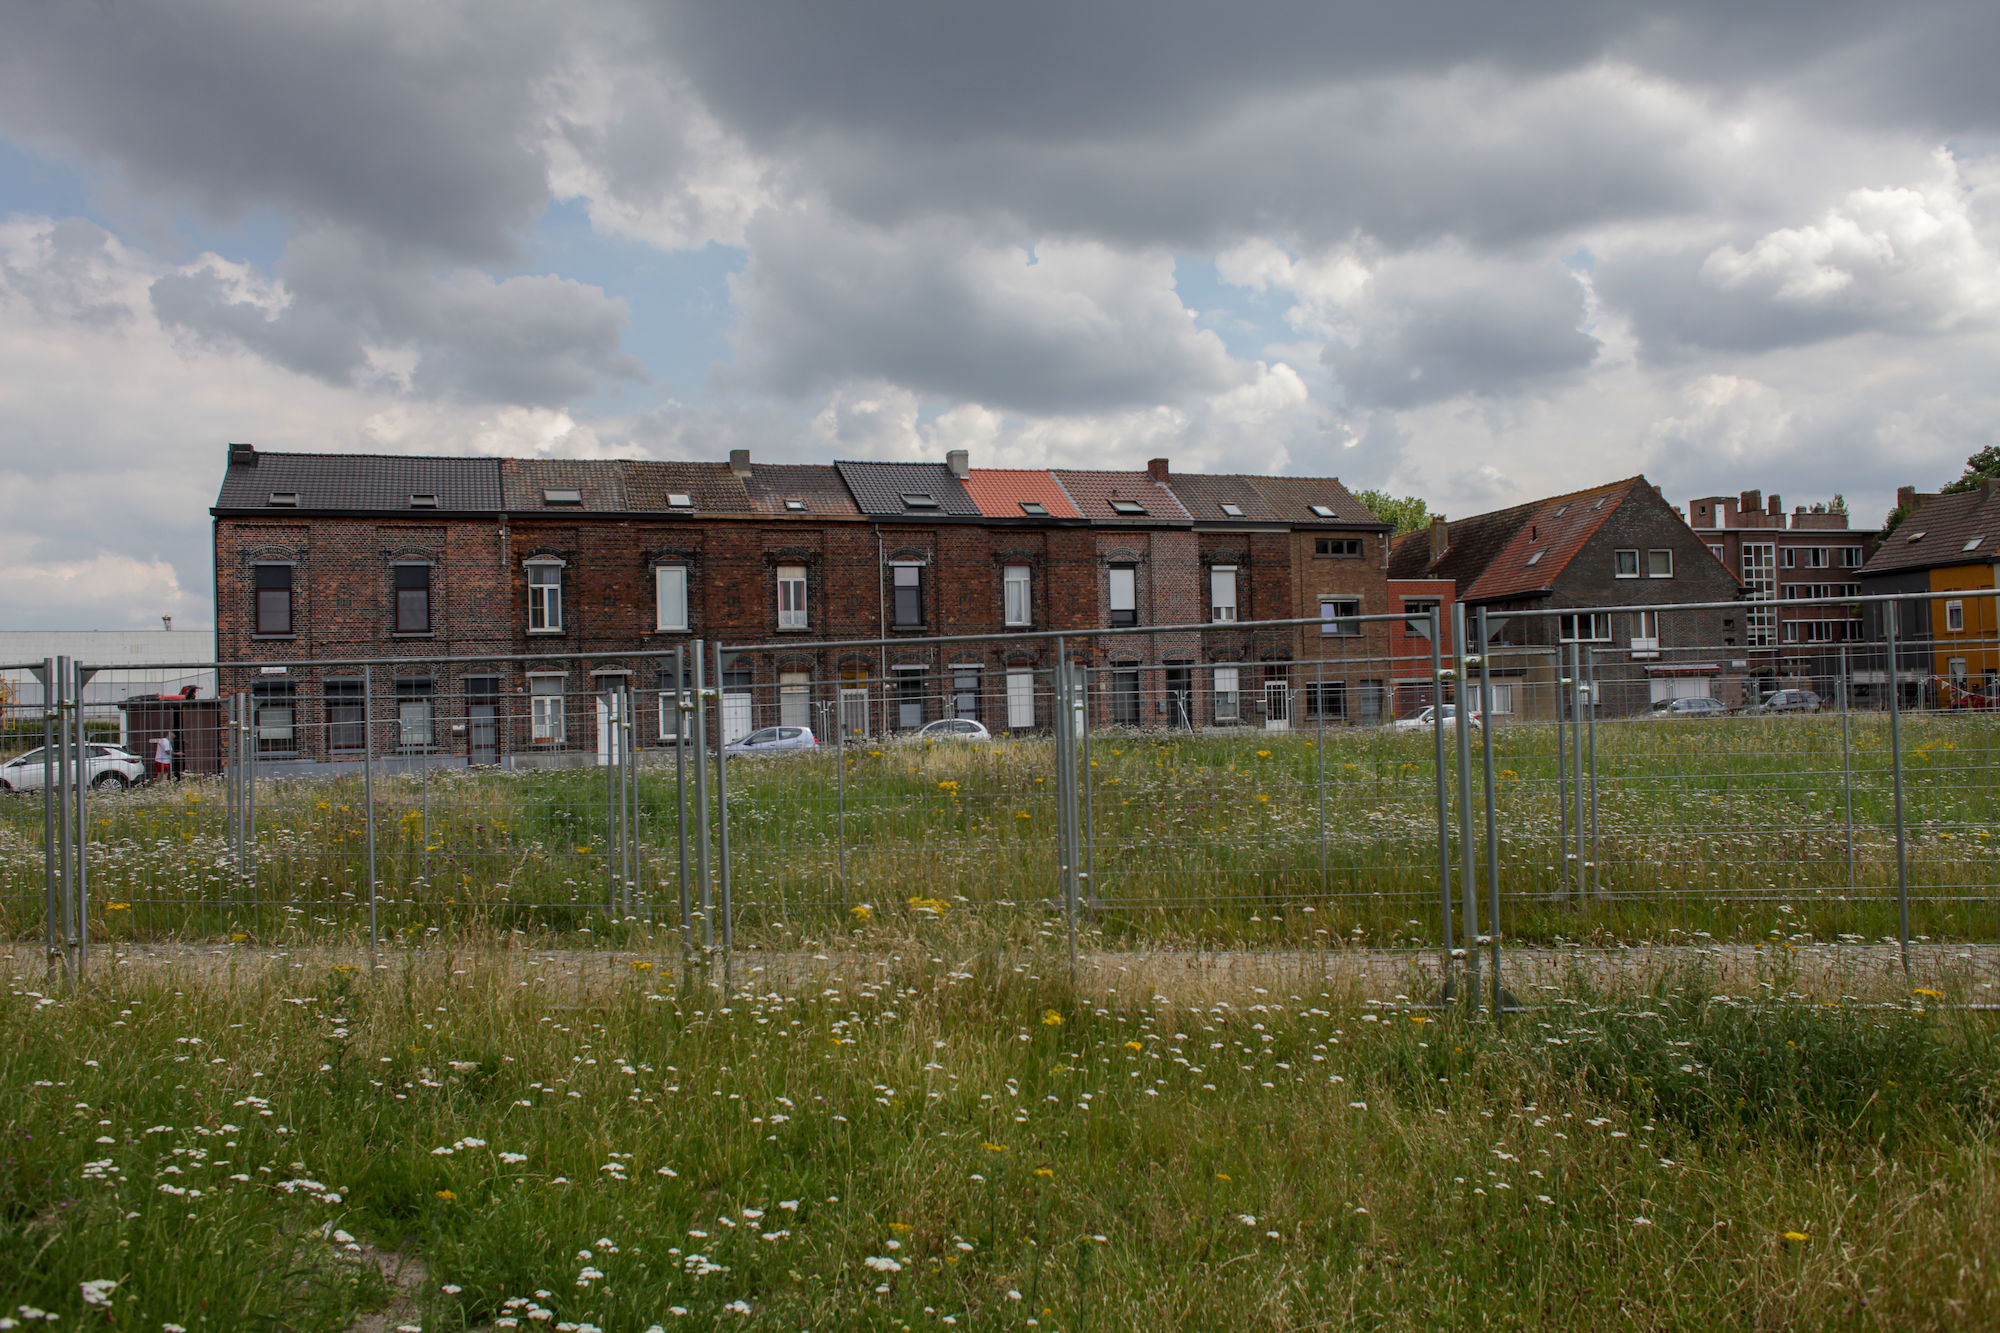 2019-07-02 Muide Meulestede prospectie Wannes_stadsvernieuwing_IMG_0367-2.jpg